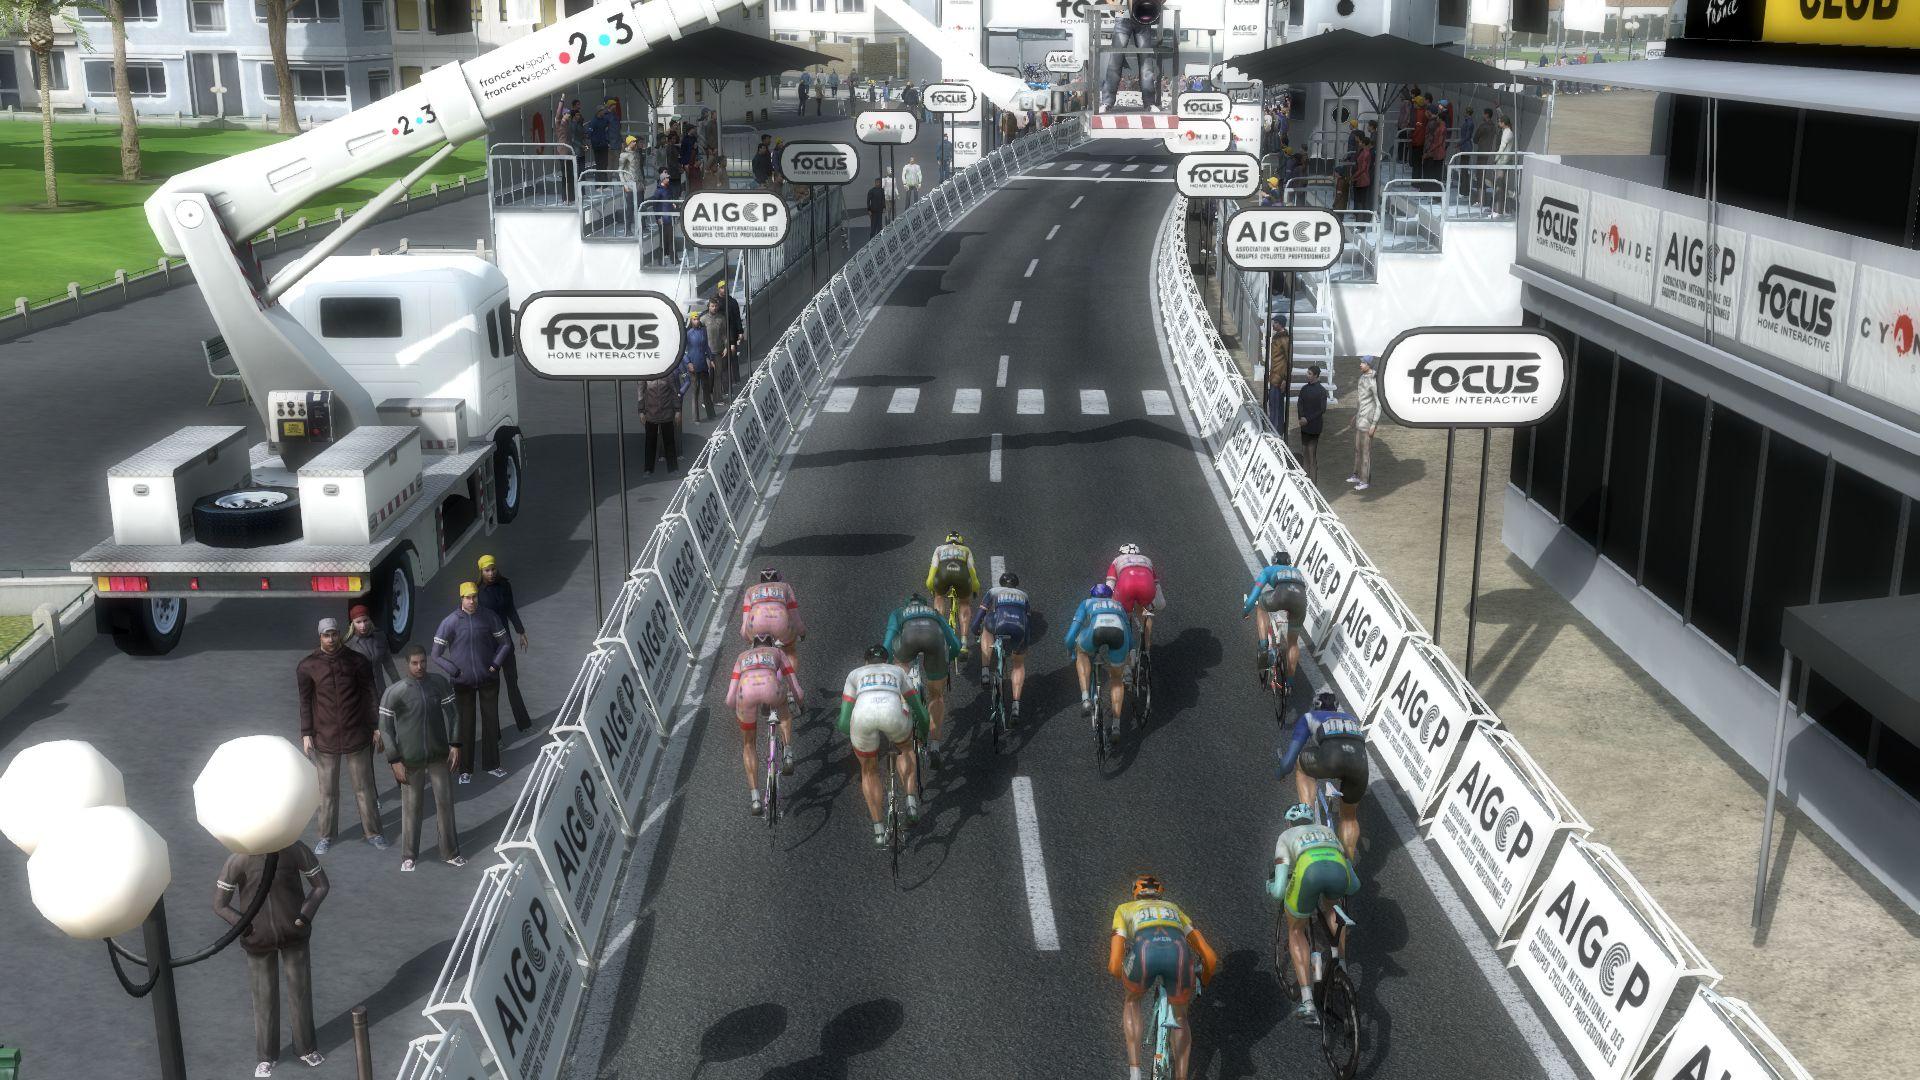 pcmdaily.com/images/mg/2019/Races/PT/Qatar/mg19_qat_s05_14.jpg